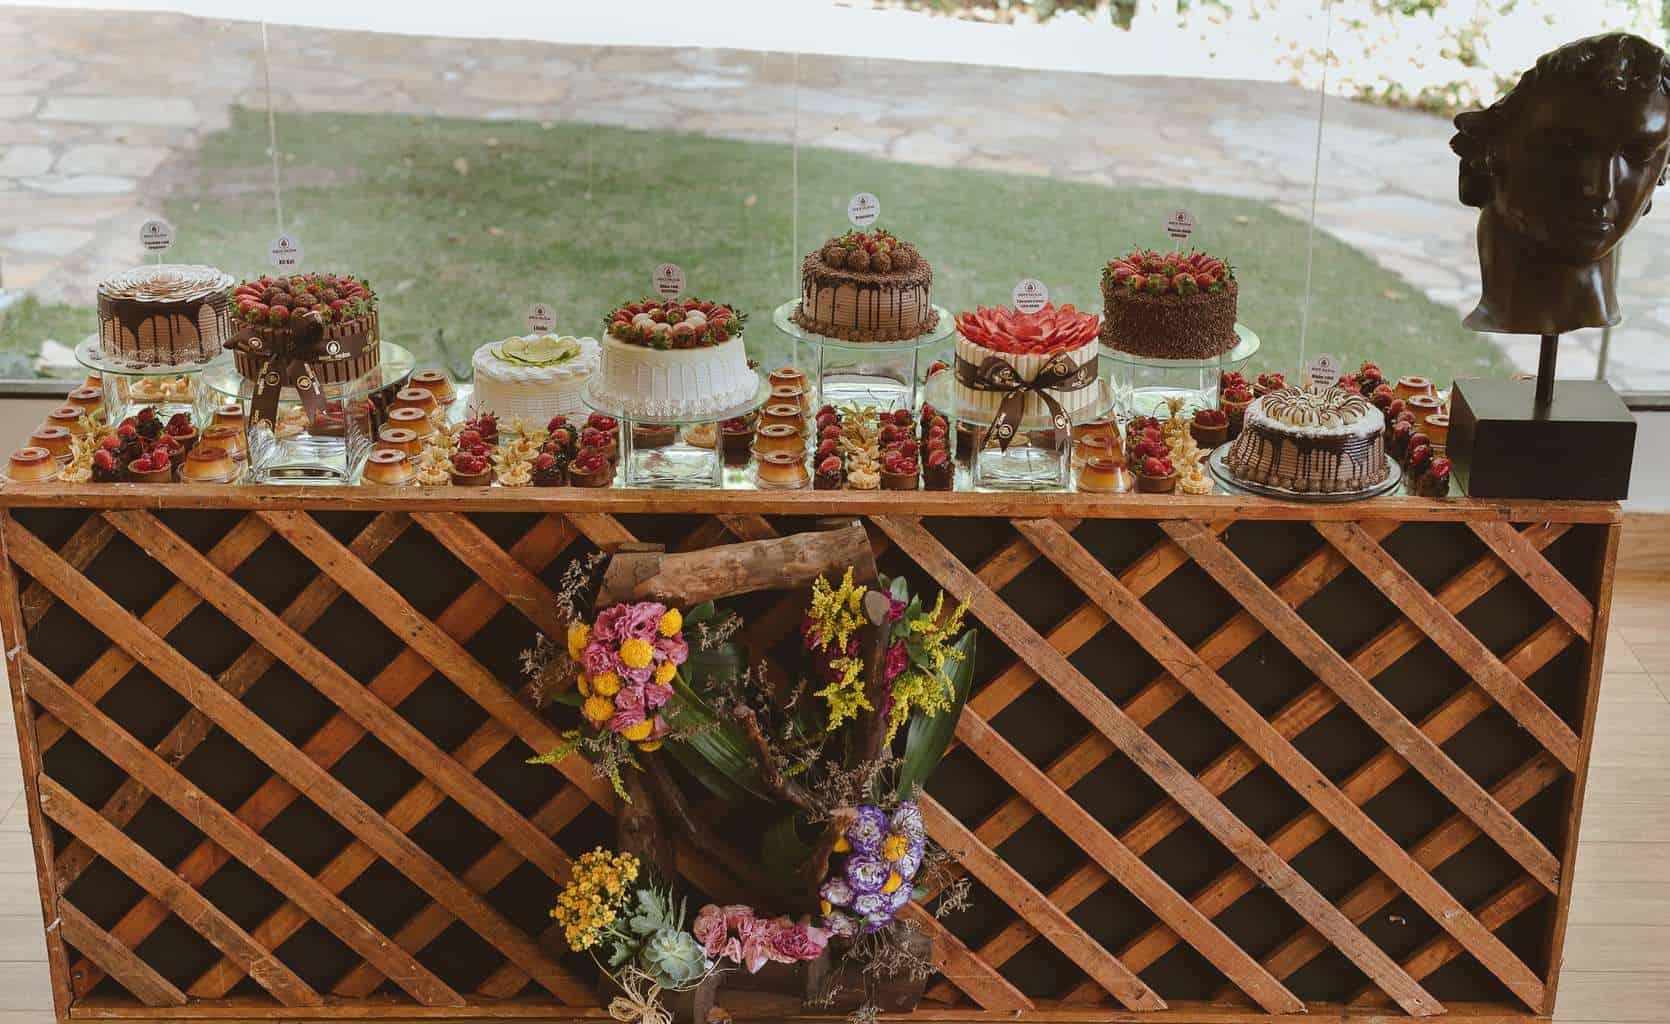 bolo-casamento-ao-ar-livre-casamento-boho-casamento-geek-casamento-rustico-casamento-Thais-e-Pedro-Revoar-Fotografia-Villa-Borghese-Eventos-16